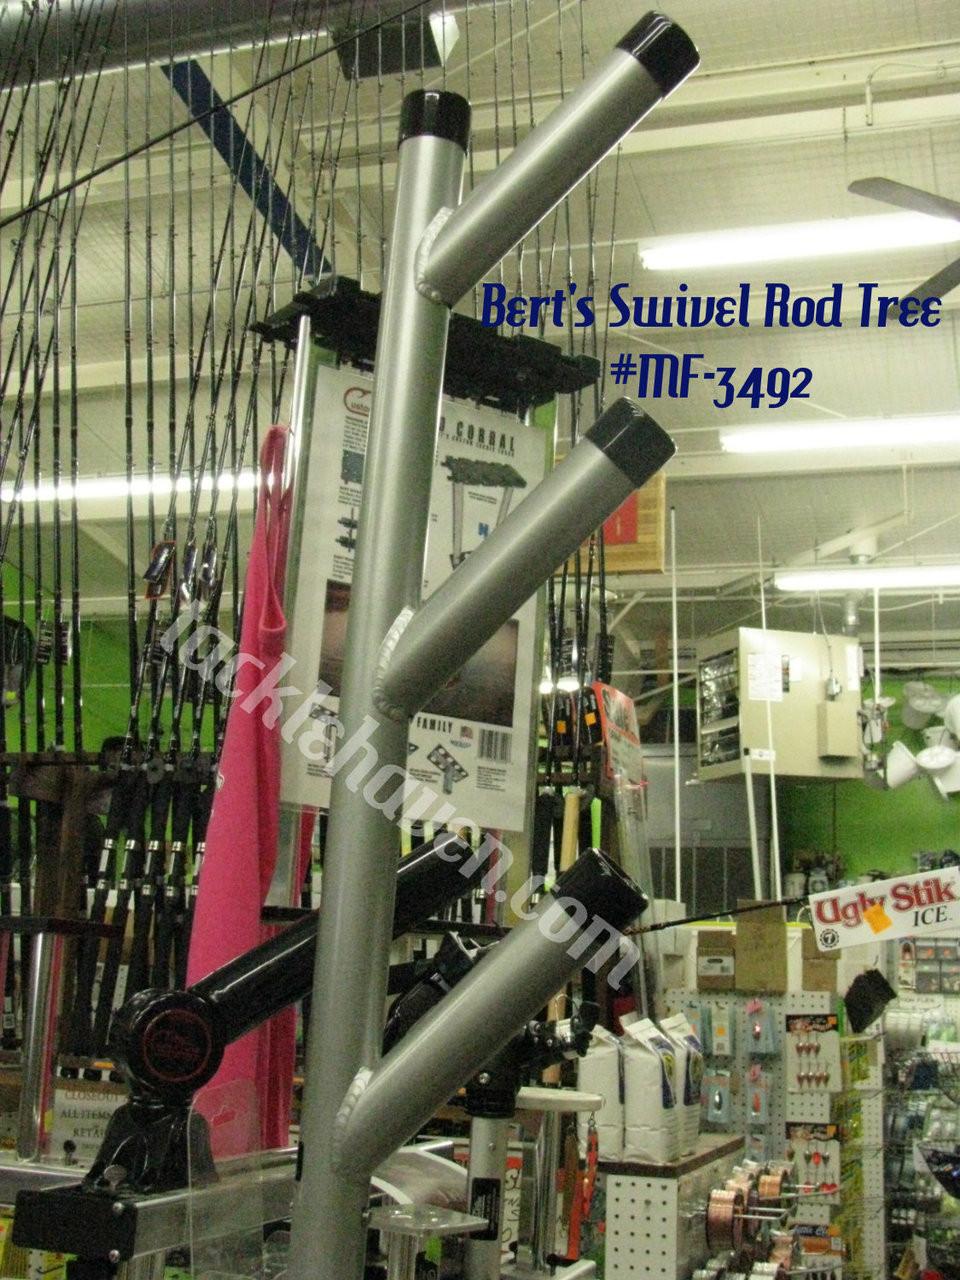 BERTS CUSTOM TACKLE SWIVEL ROD TREE MF-3492